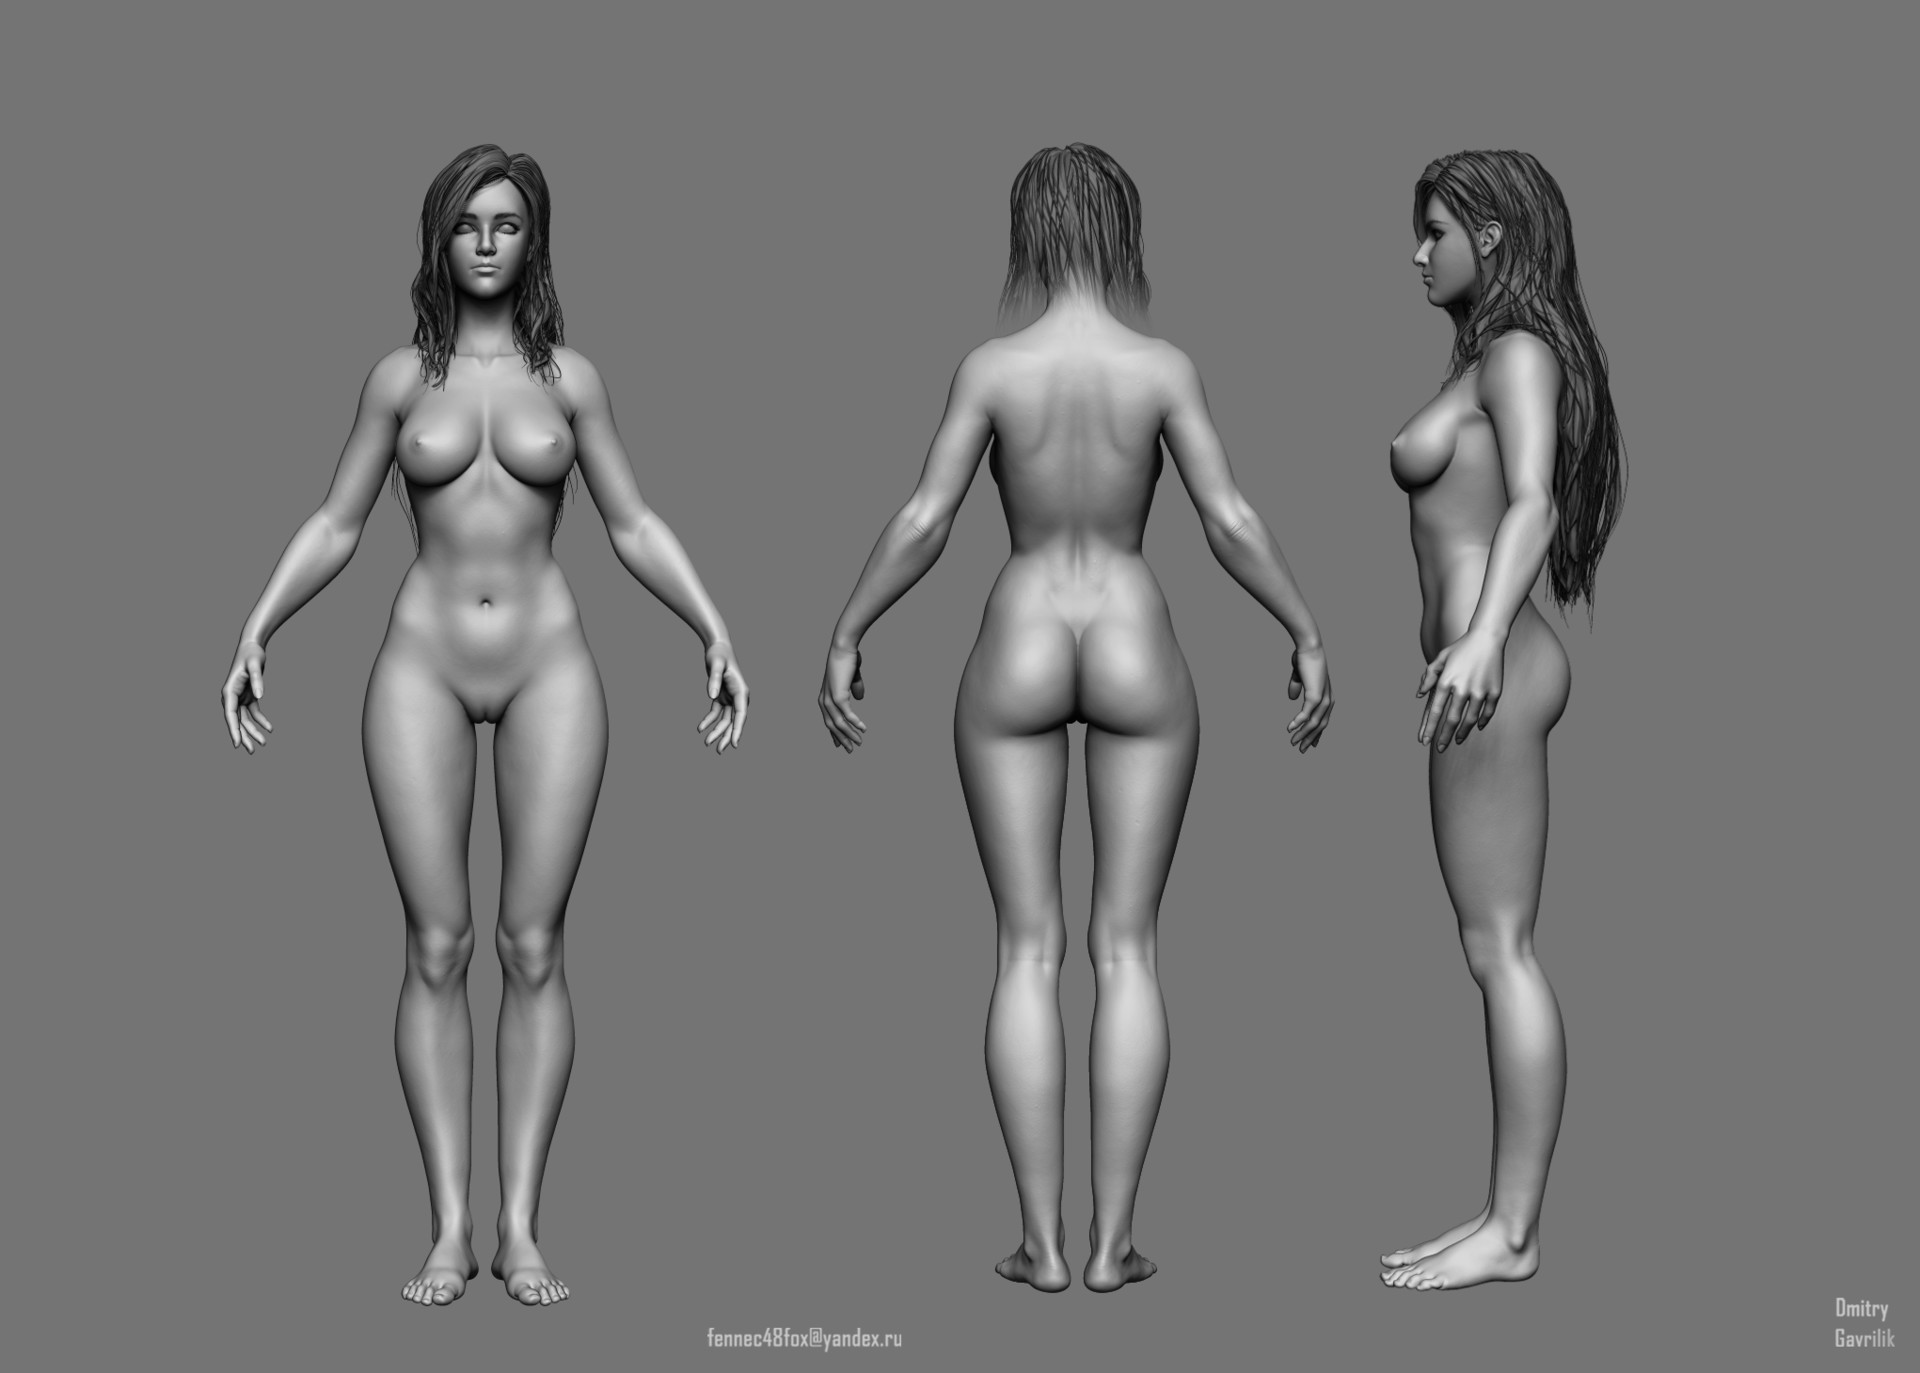 3d model girl nude final, sorry